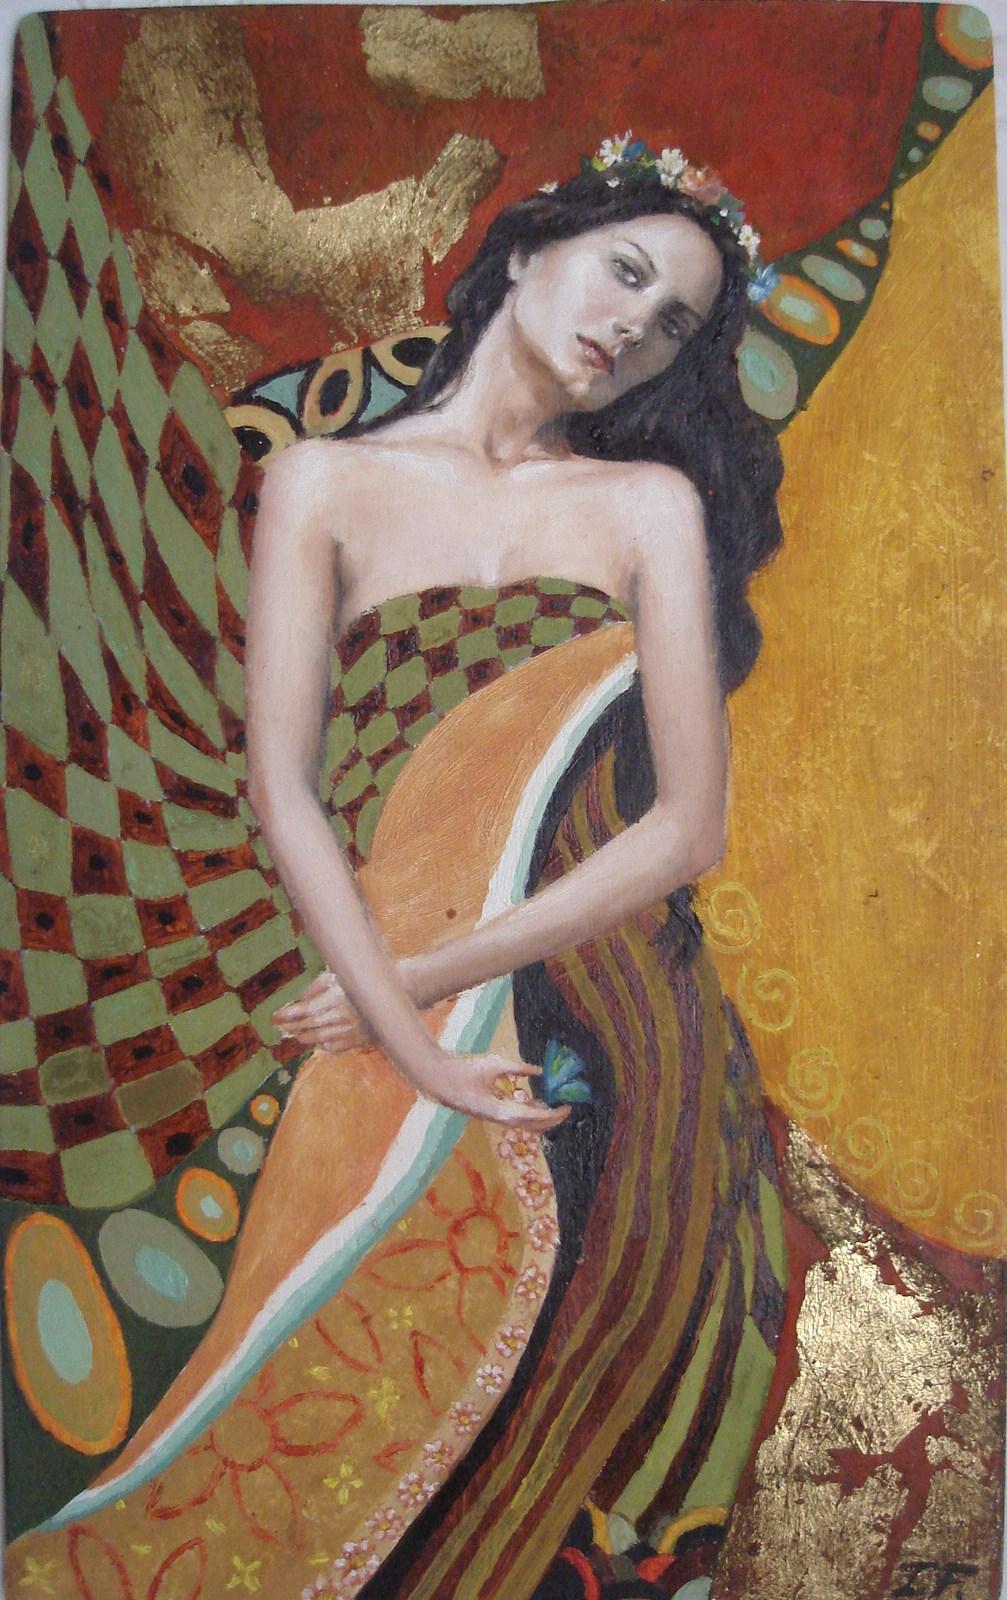 Homenaje a Klimt